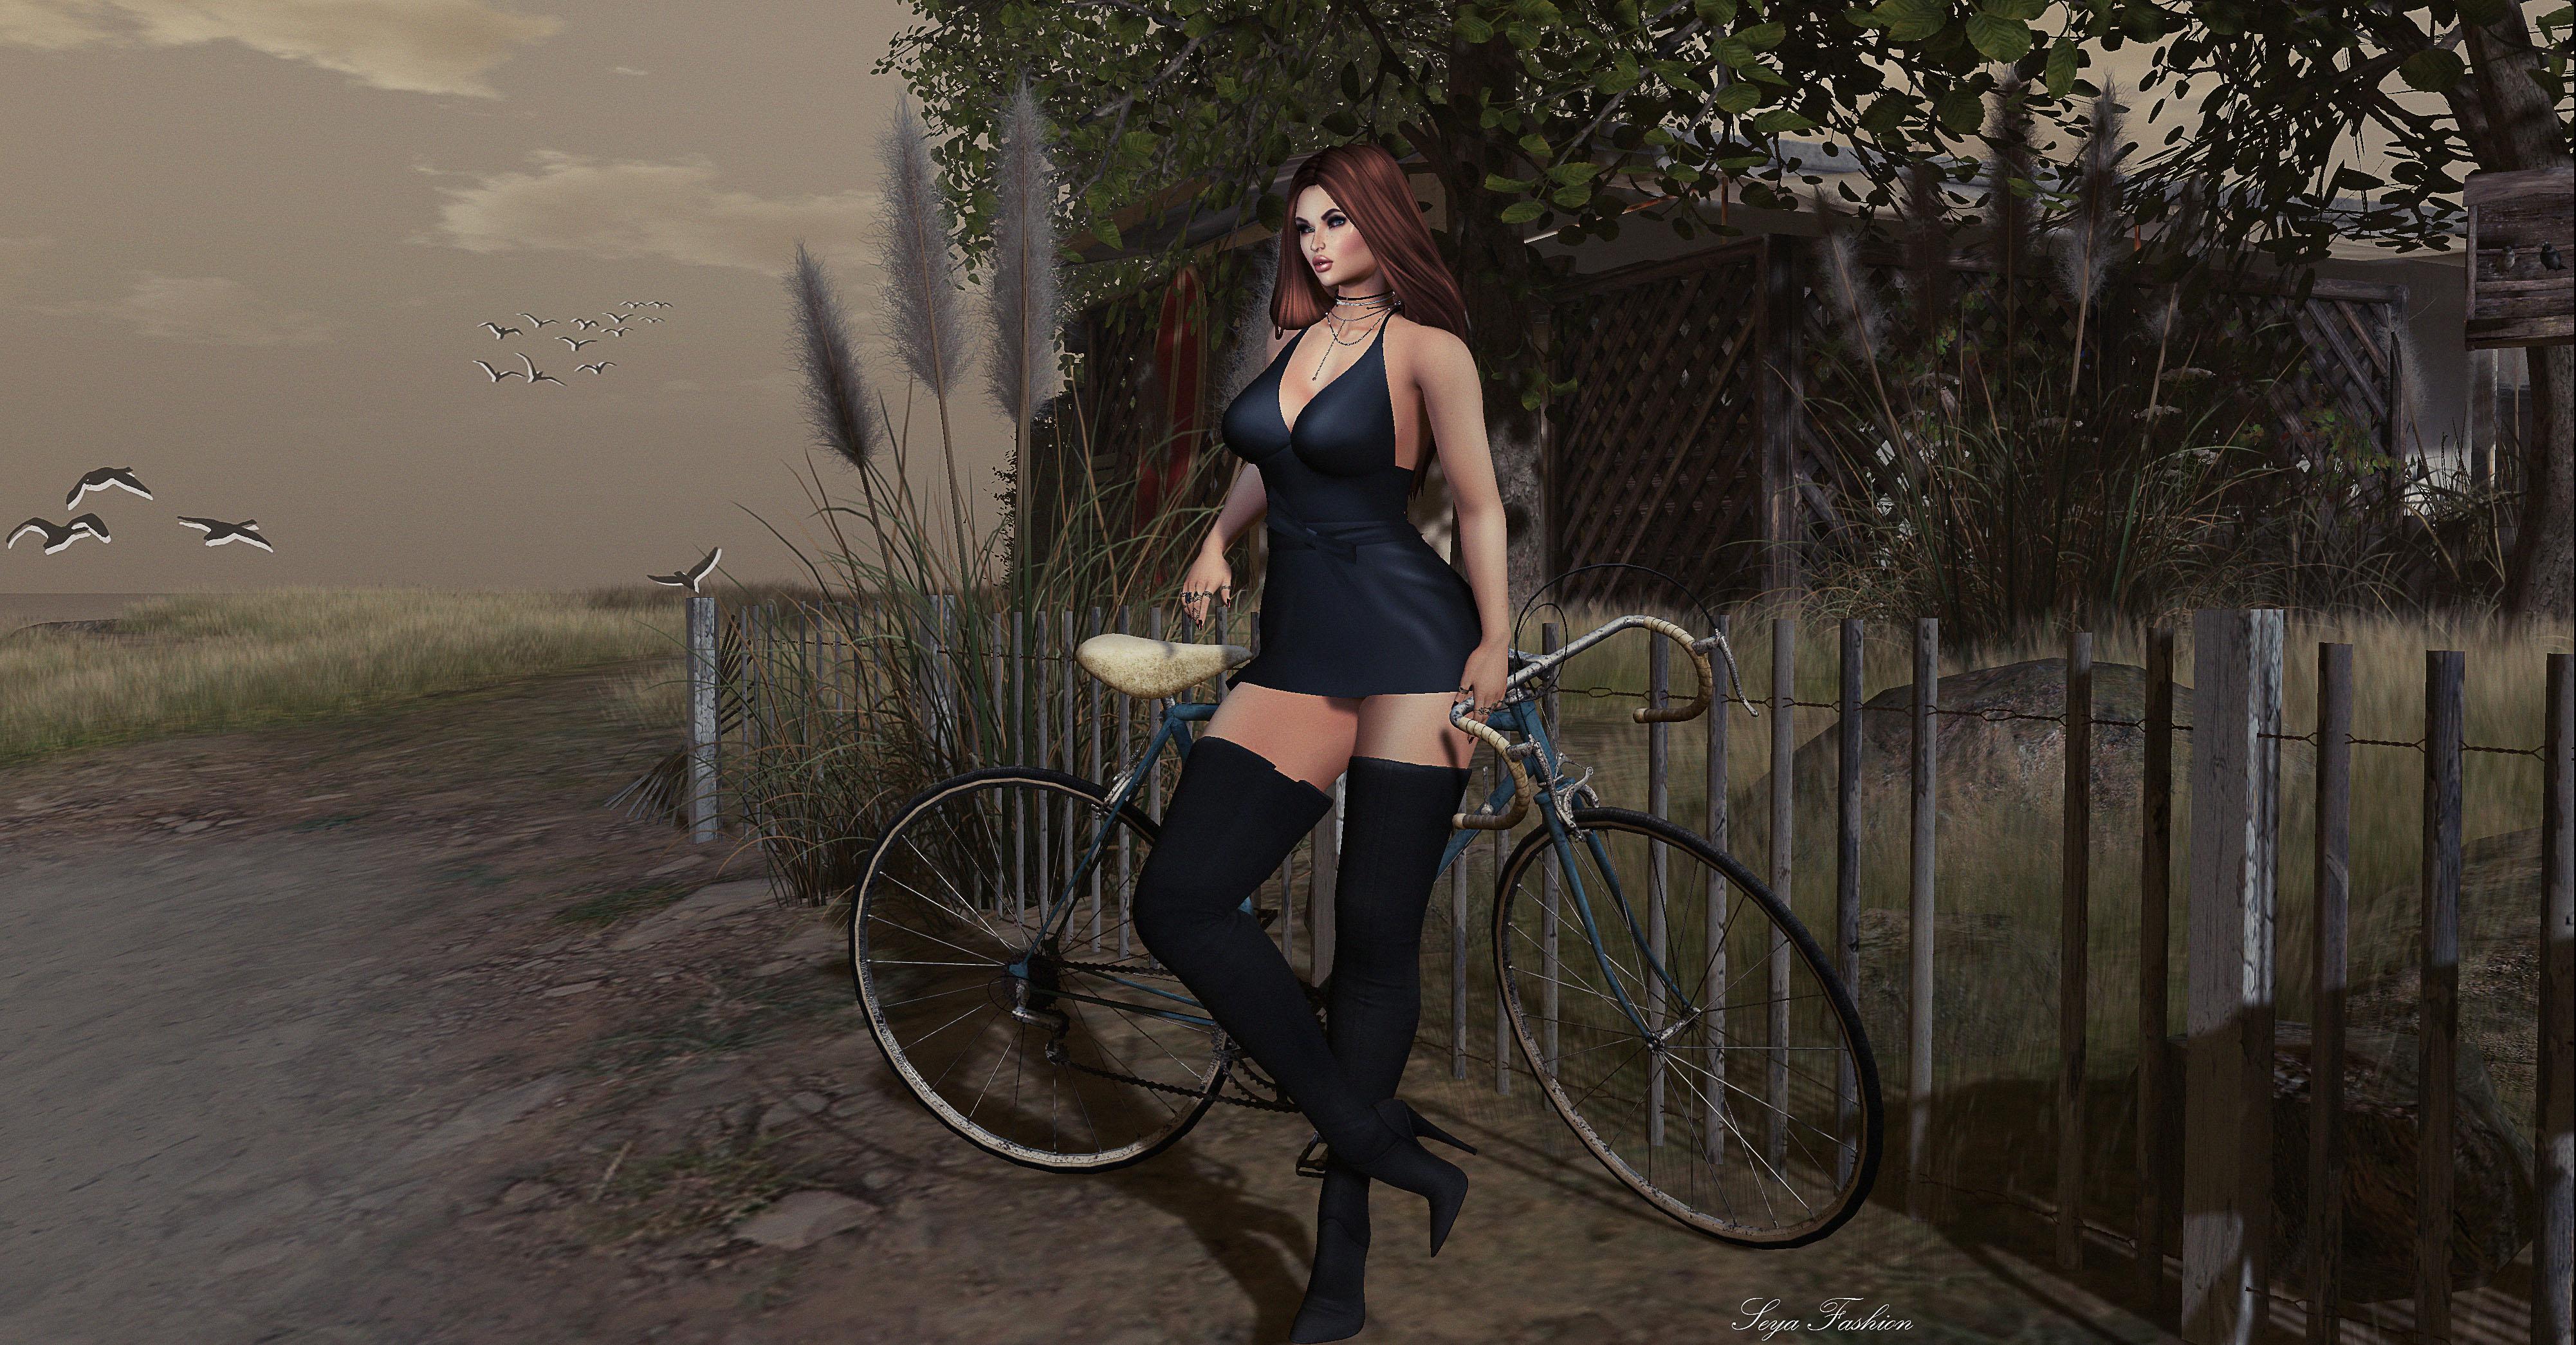 Wallpaper Land Vehicle Road Bicycle Cycling Tree Girl